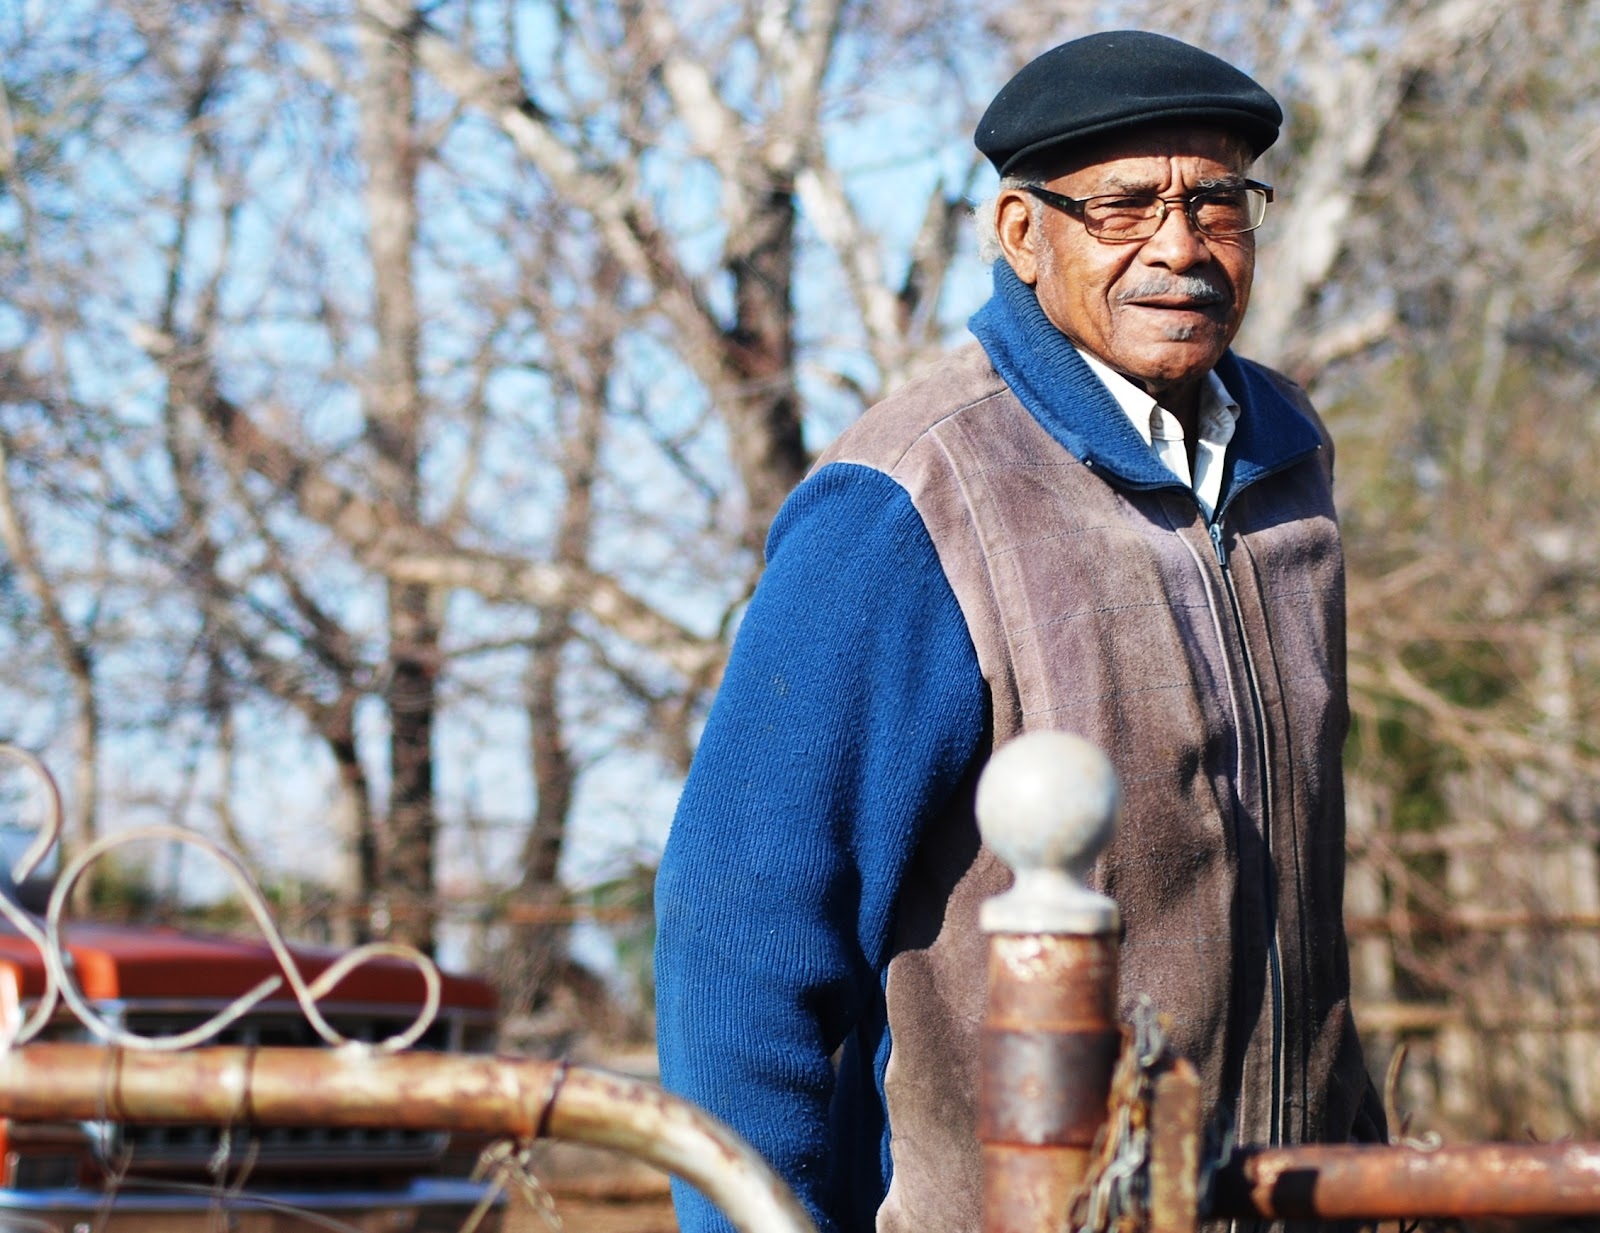 Old Black Gentleman